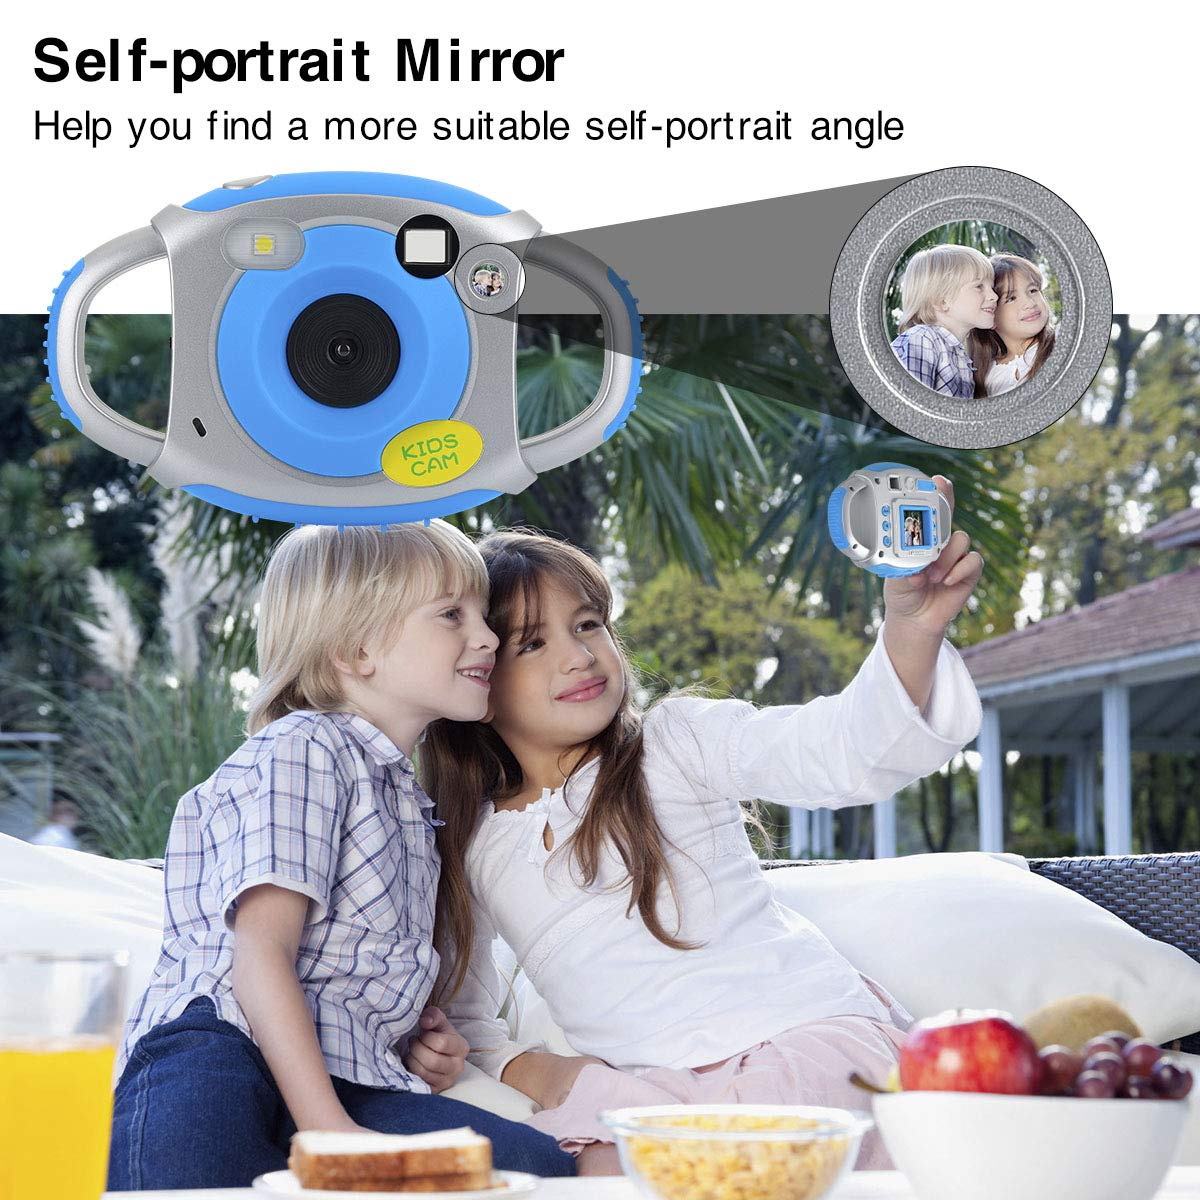 Funkprofi Kids Camera, Kids Digital Video Camera 5MP 1080P HD Recorder Camcorder with 32GB TF Memory Card, 1.77 Inch Screen, Funny Photo Frame, for Kids by Funkprofi (Image #6)